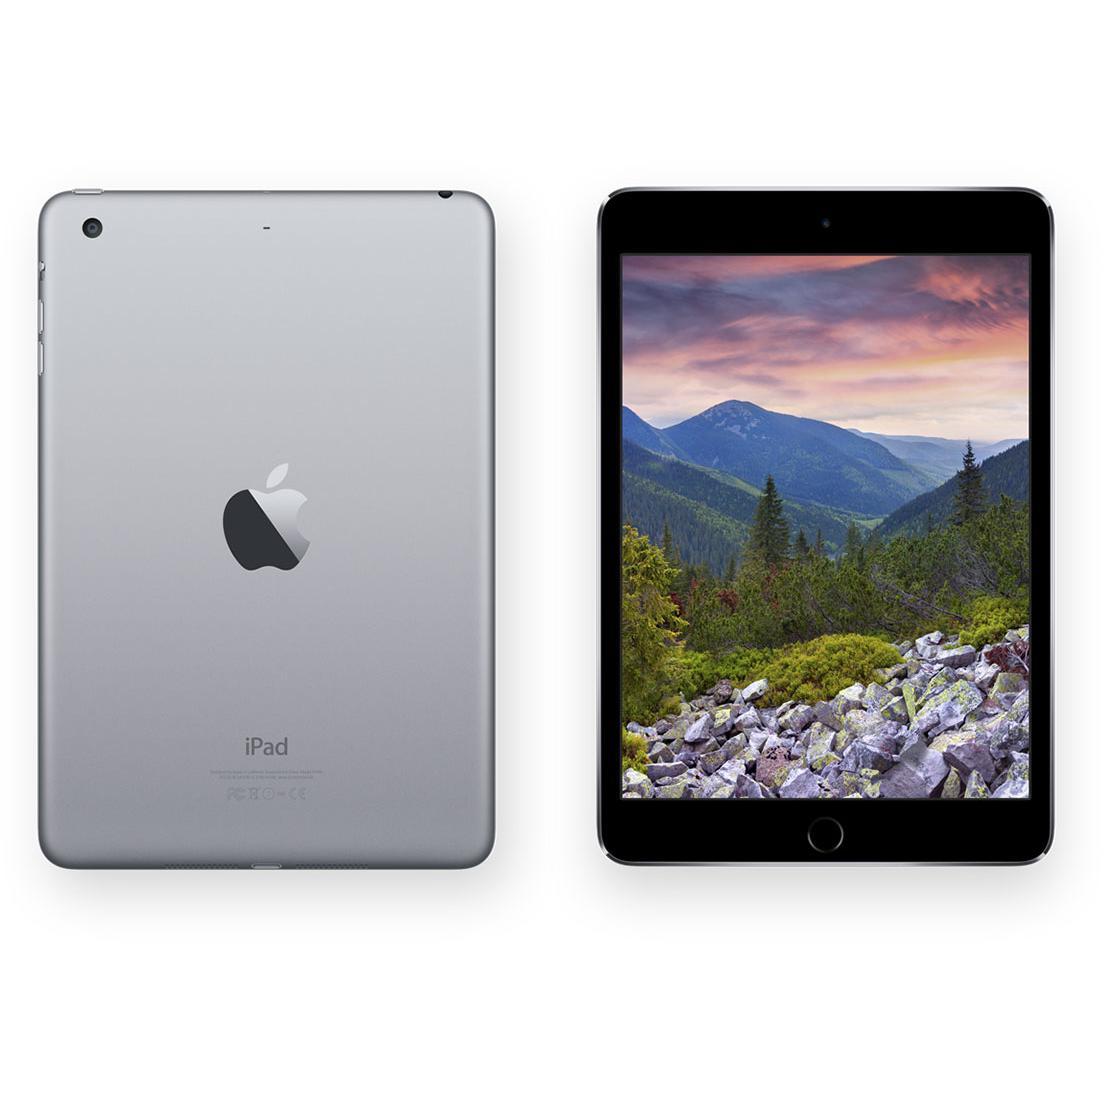 iPad mini 2 7.9'' 64 Go - Wifi - Gris sidéral - Débloqué